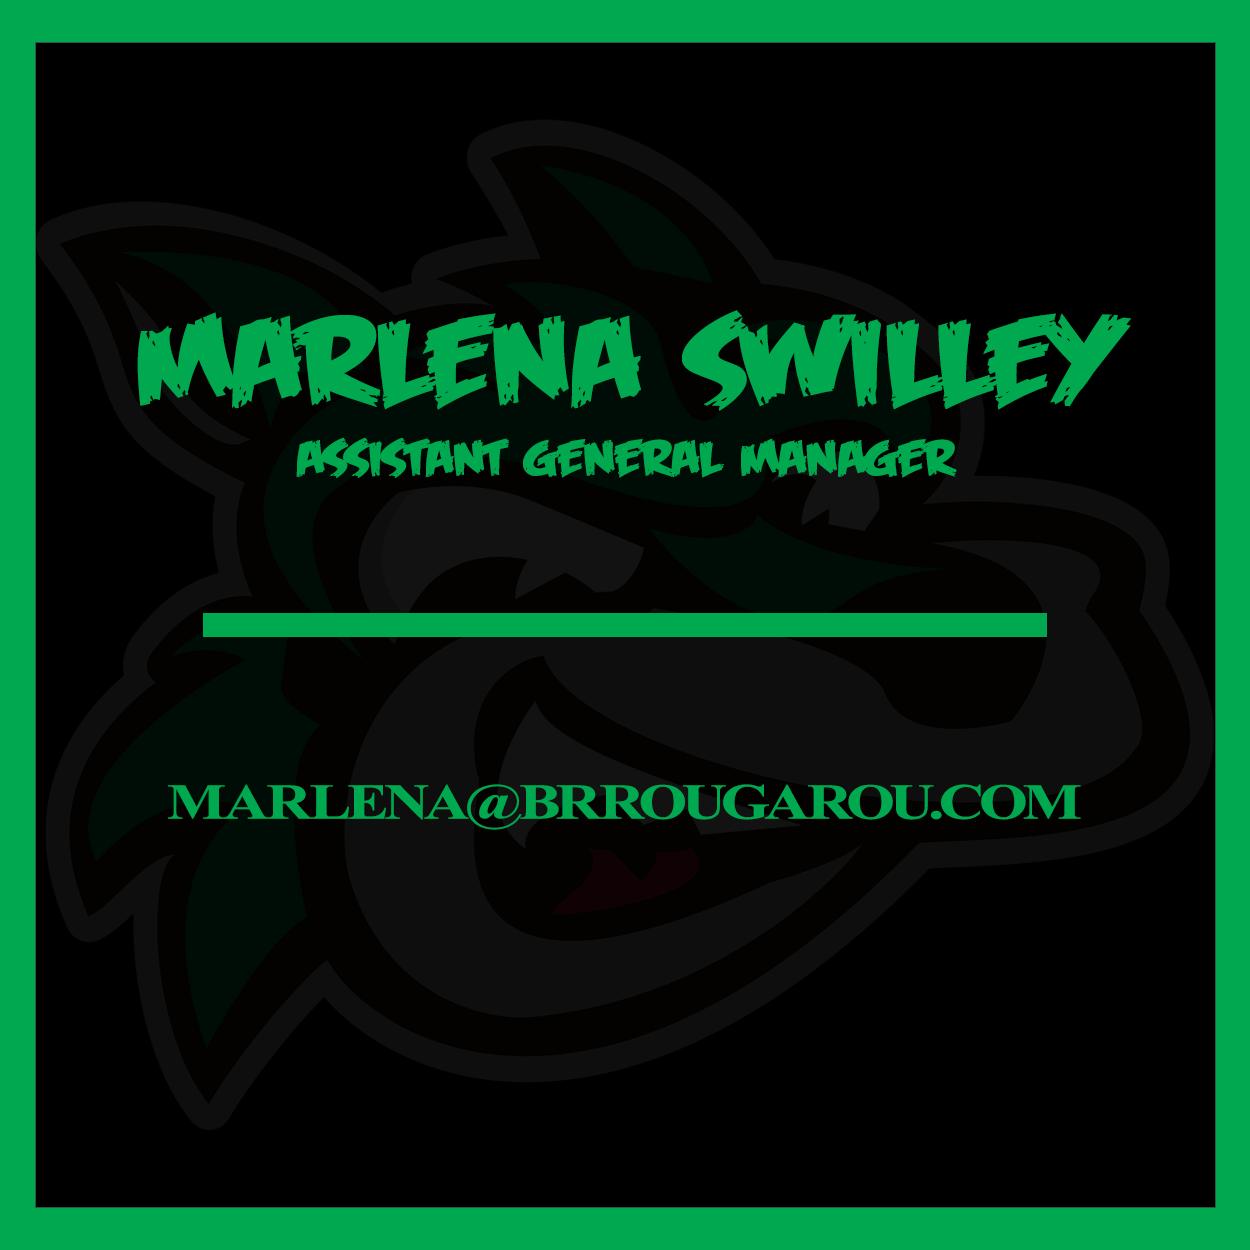 Marlena Swilley